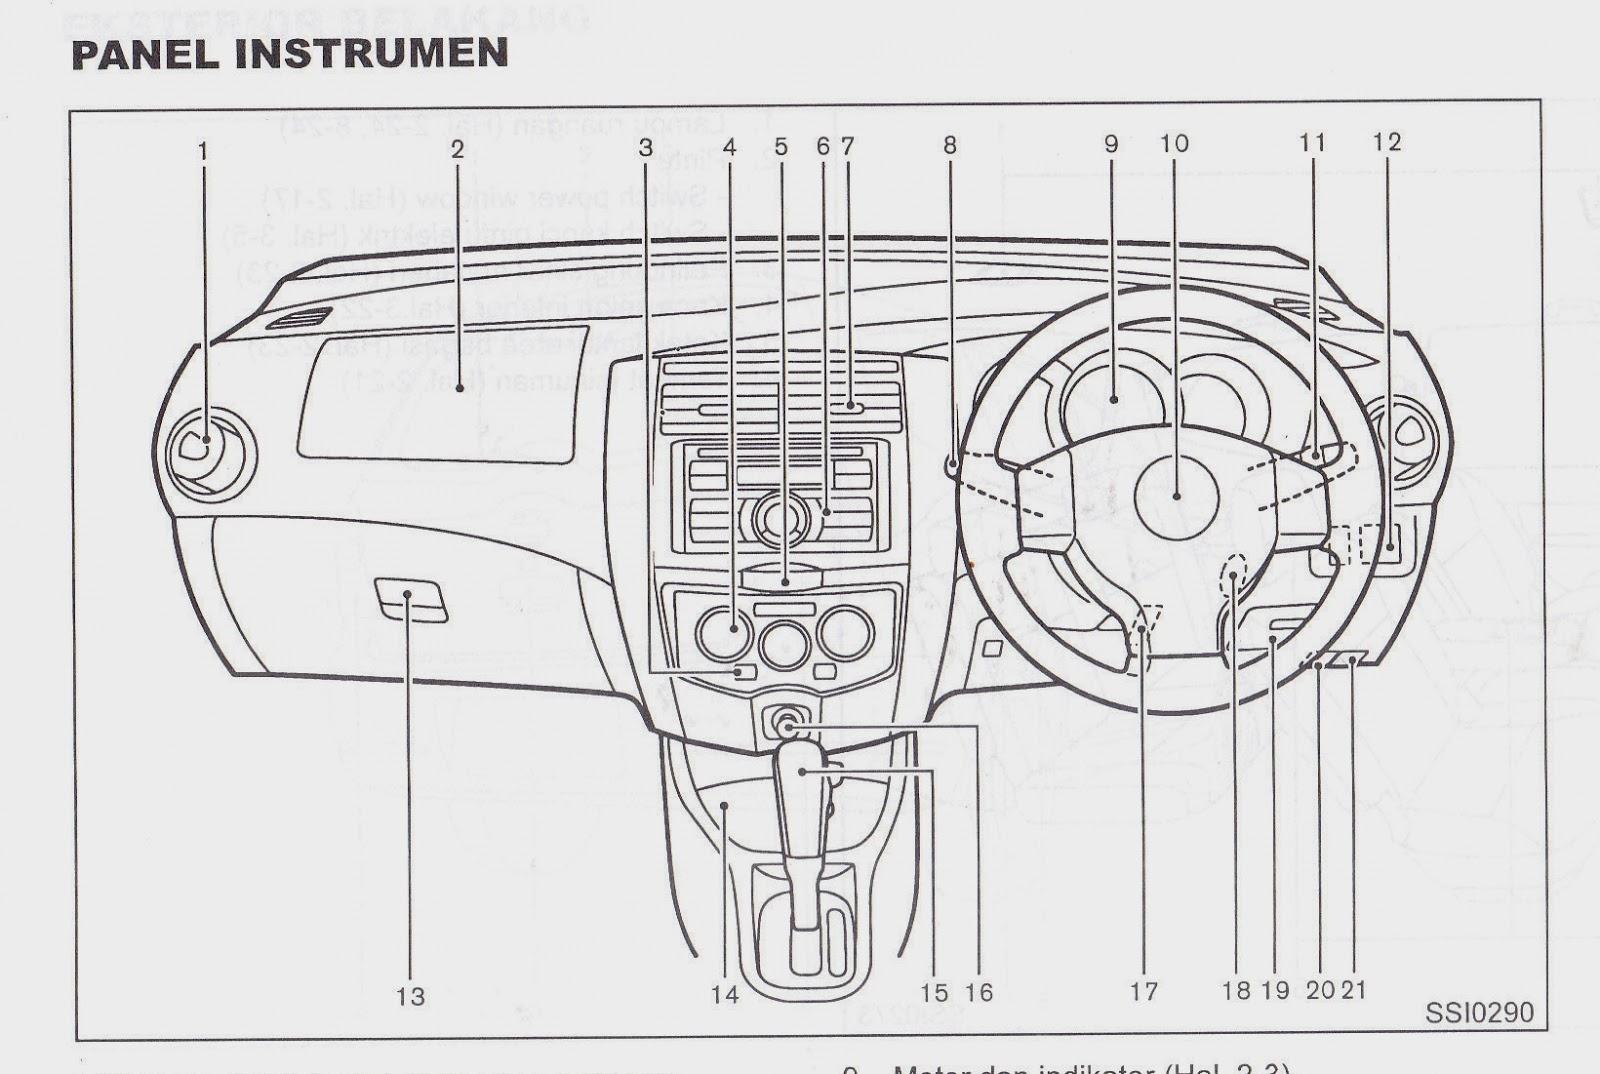 Buku Panduan Nissan Grand Livina 1.8 XV: Panel Instrumen